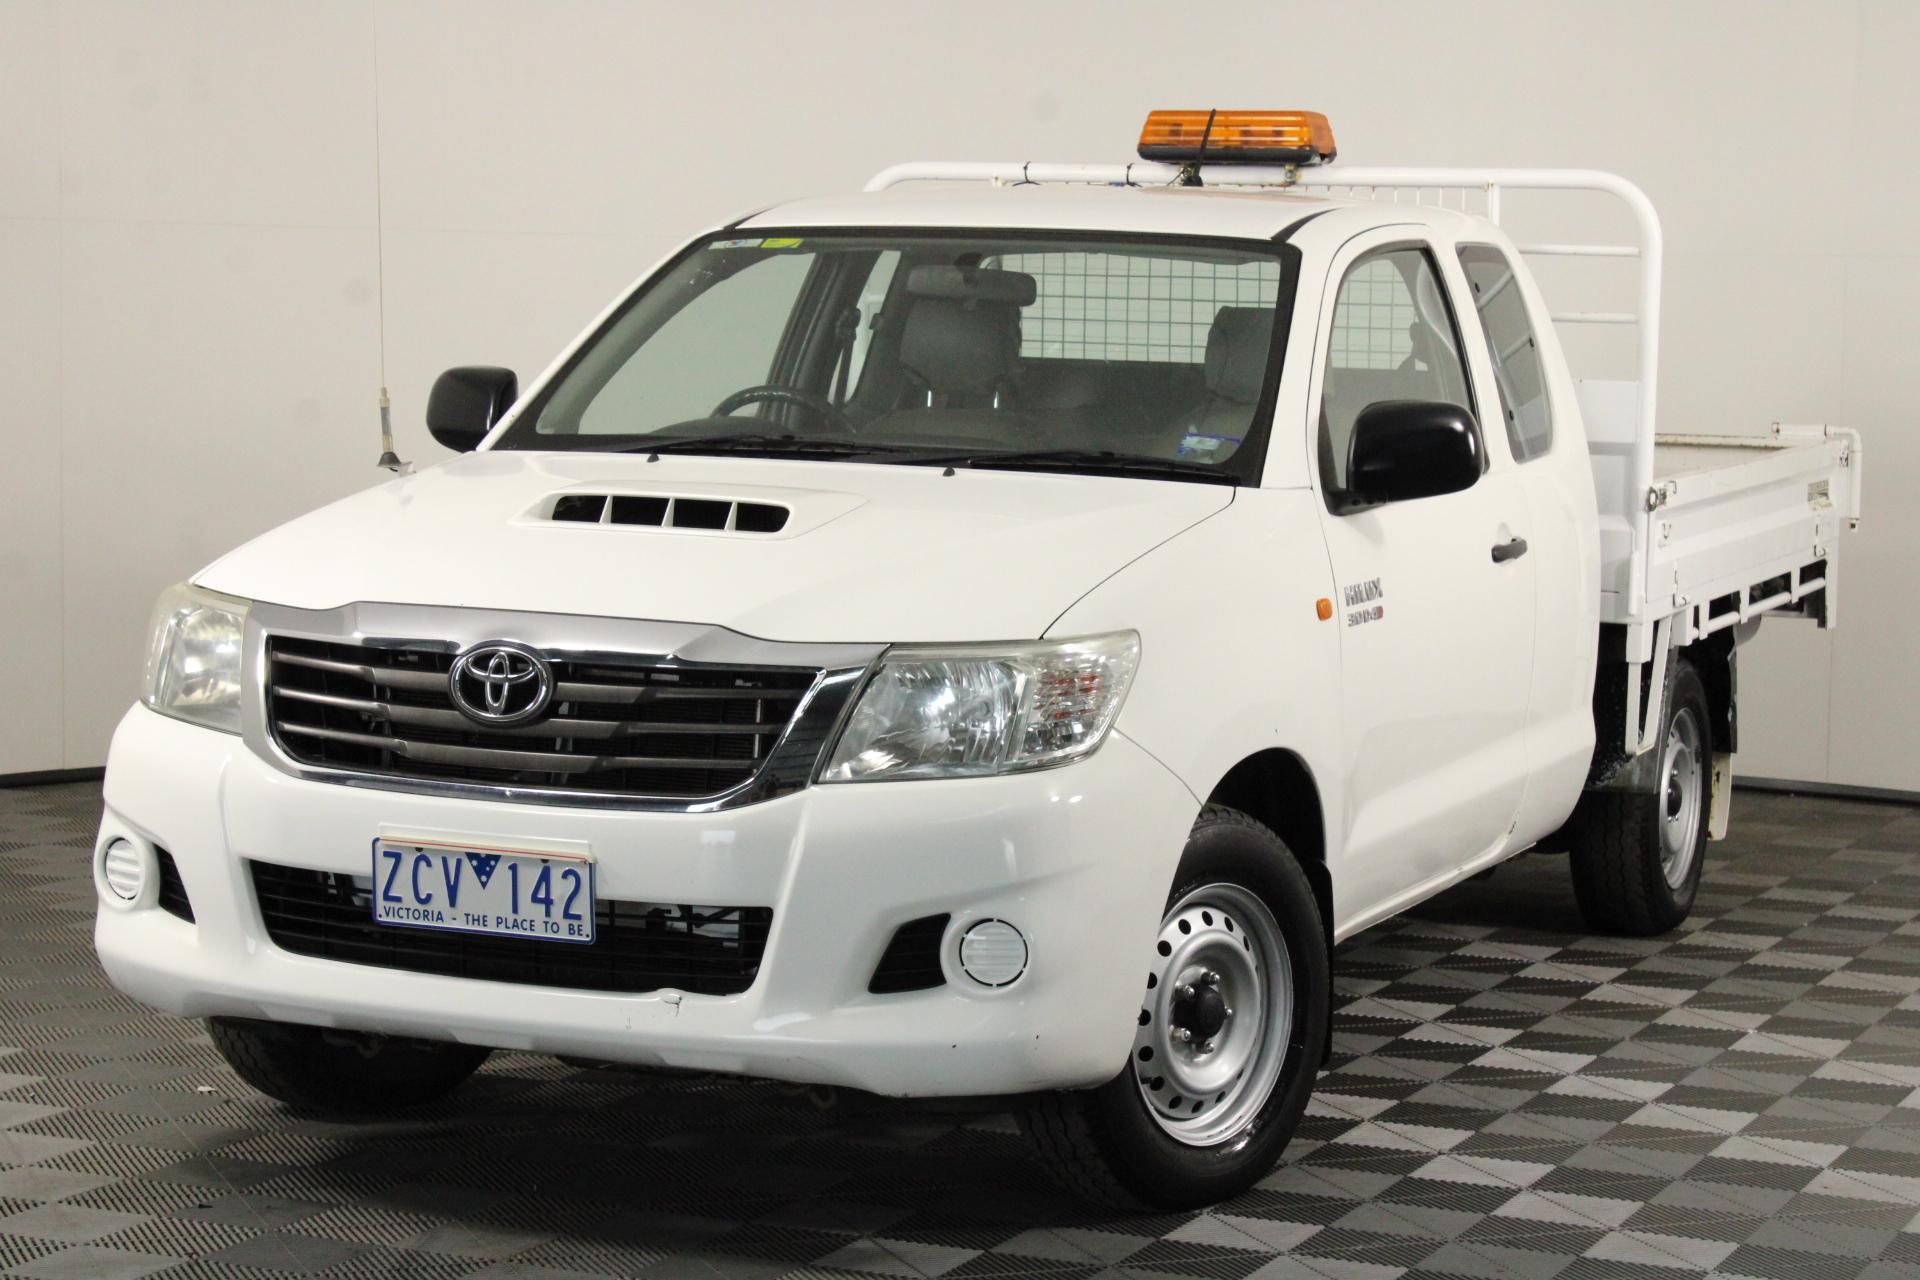 2012 Toyota Hilux 4X2 SR KUN16R Turbo Diesel Manual Ute